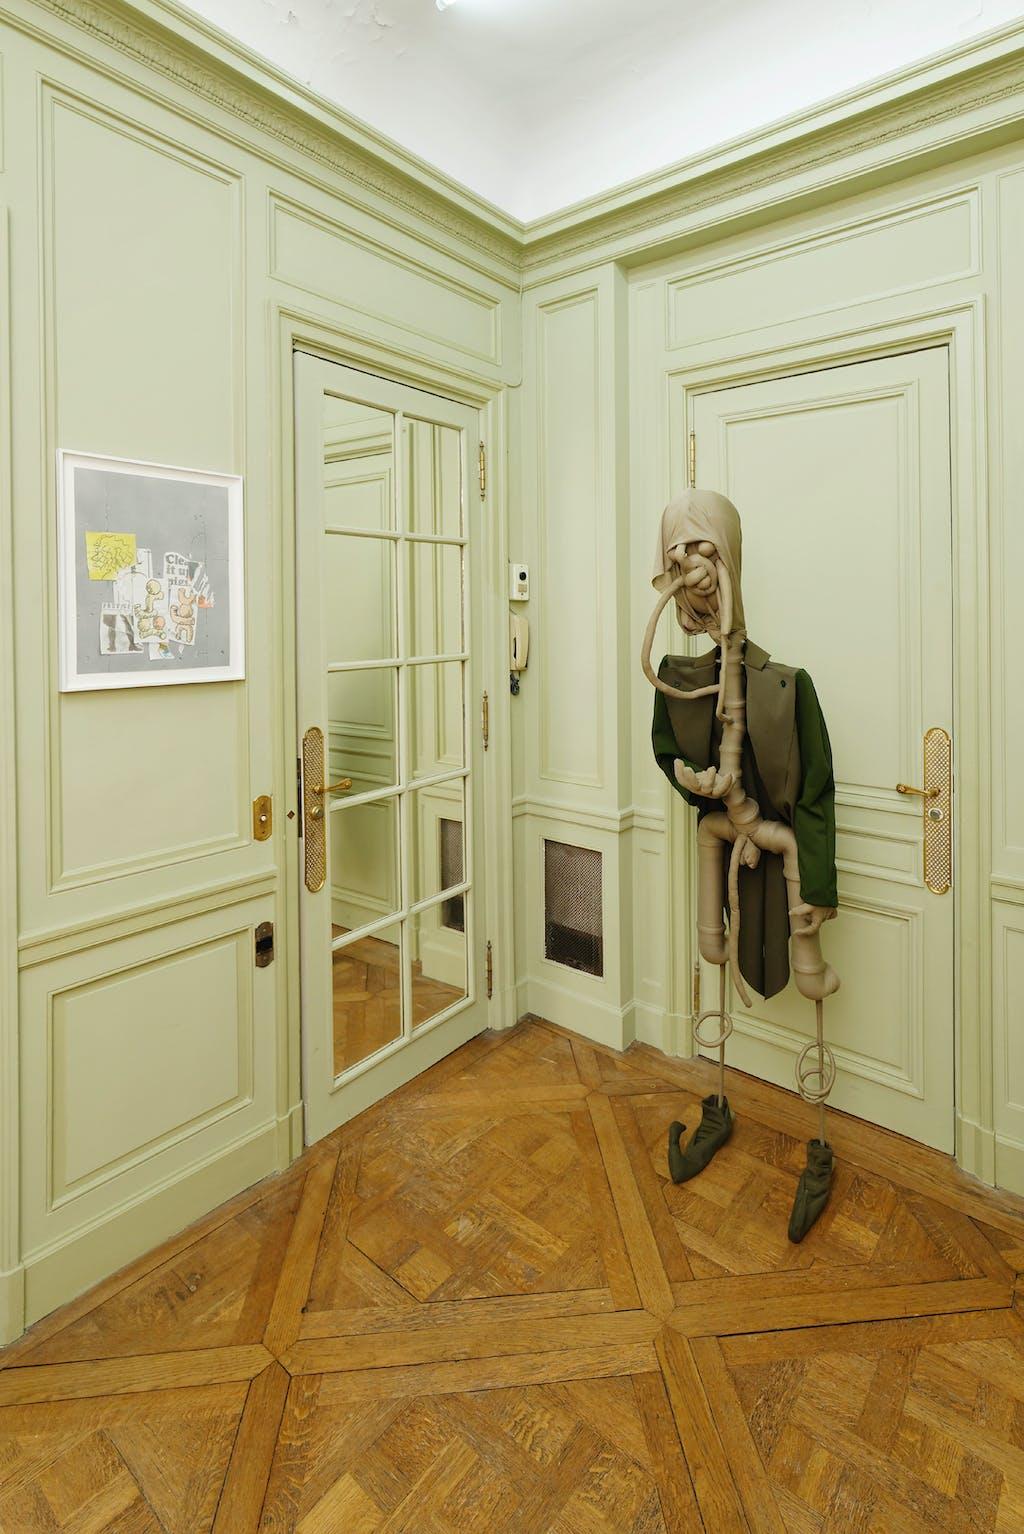 Crevècoeur - © Paris Internationale